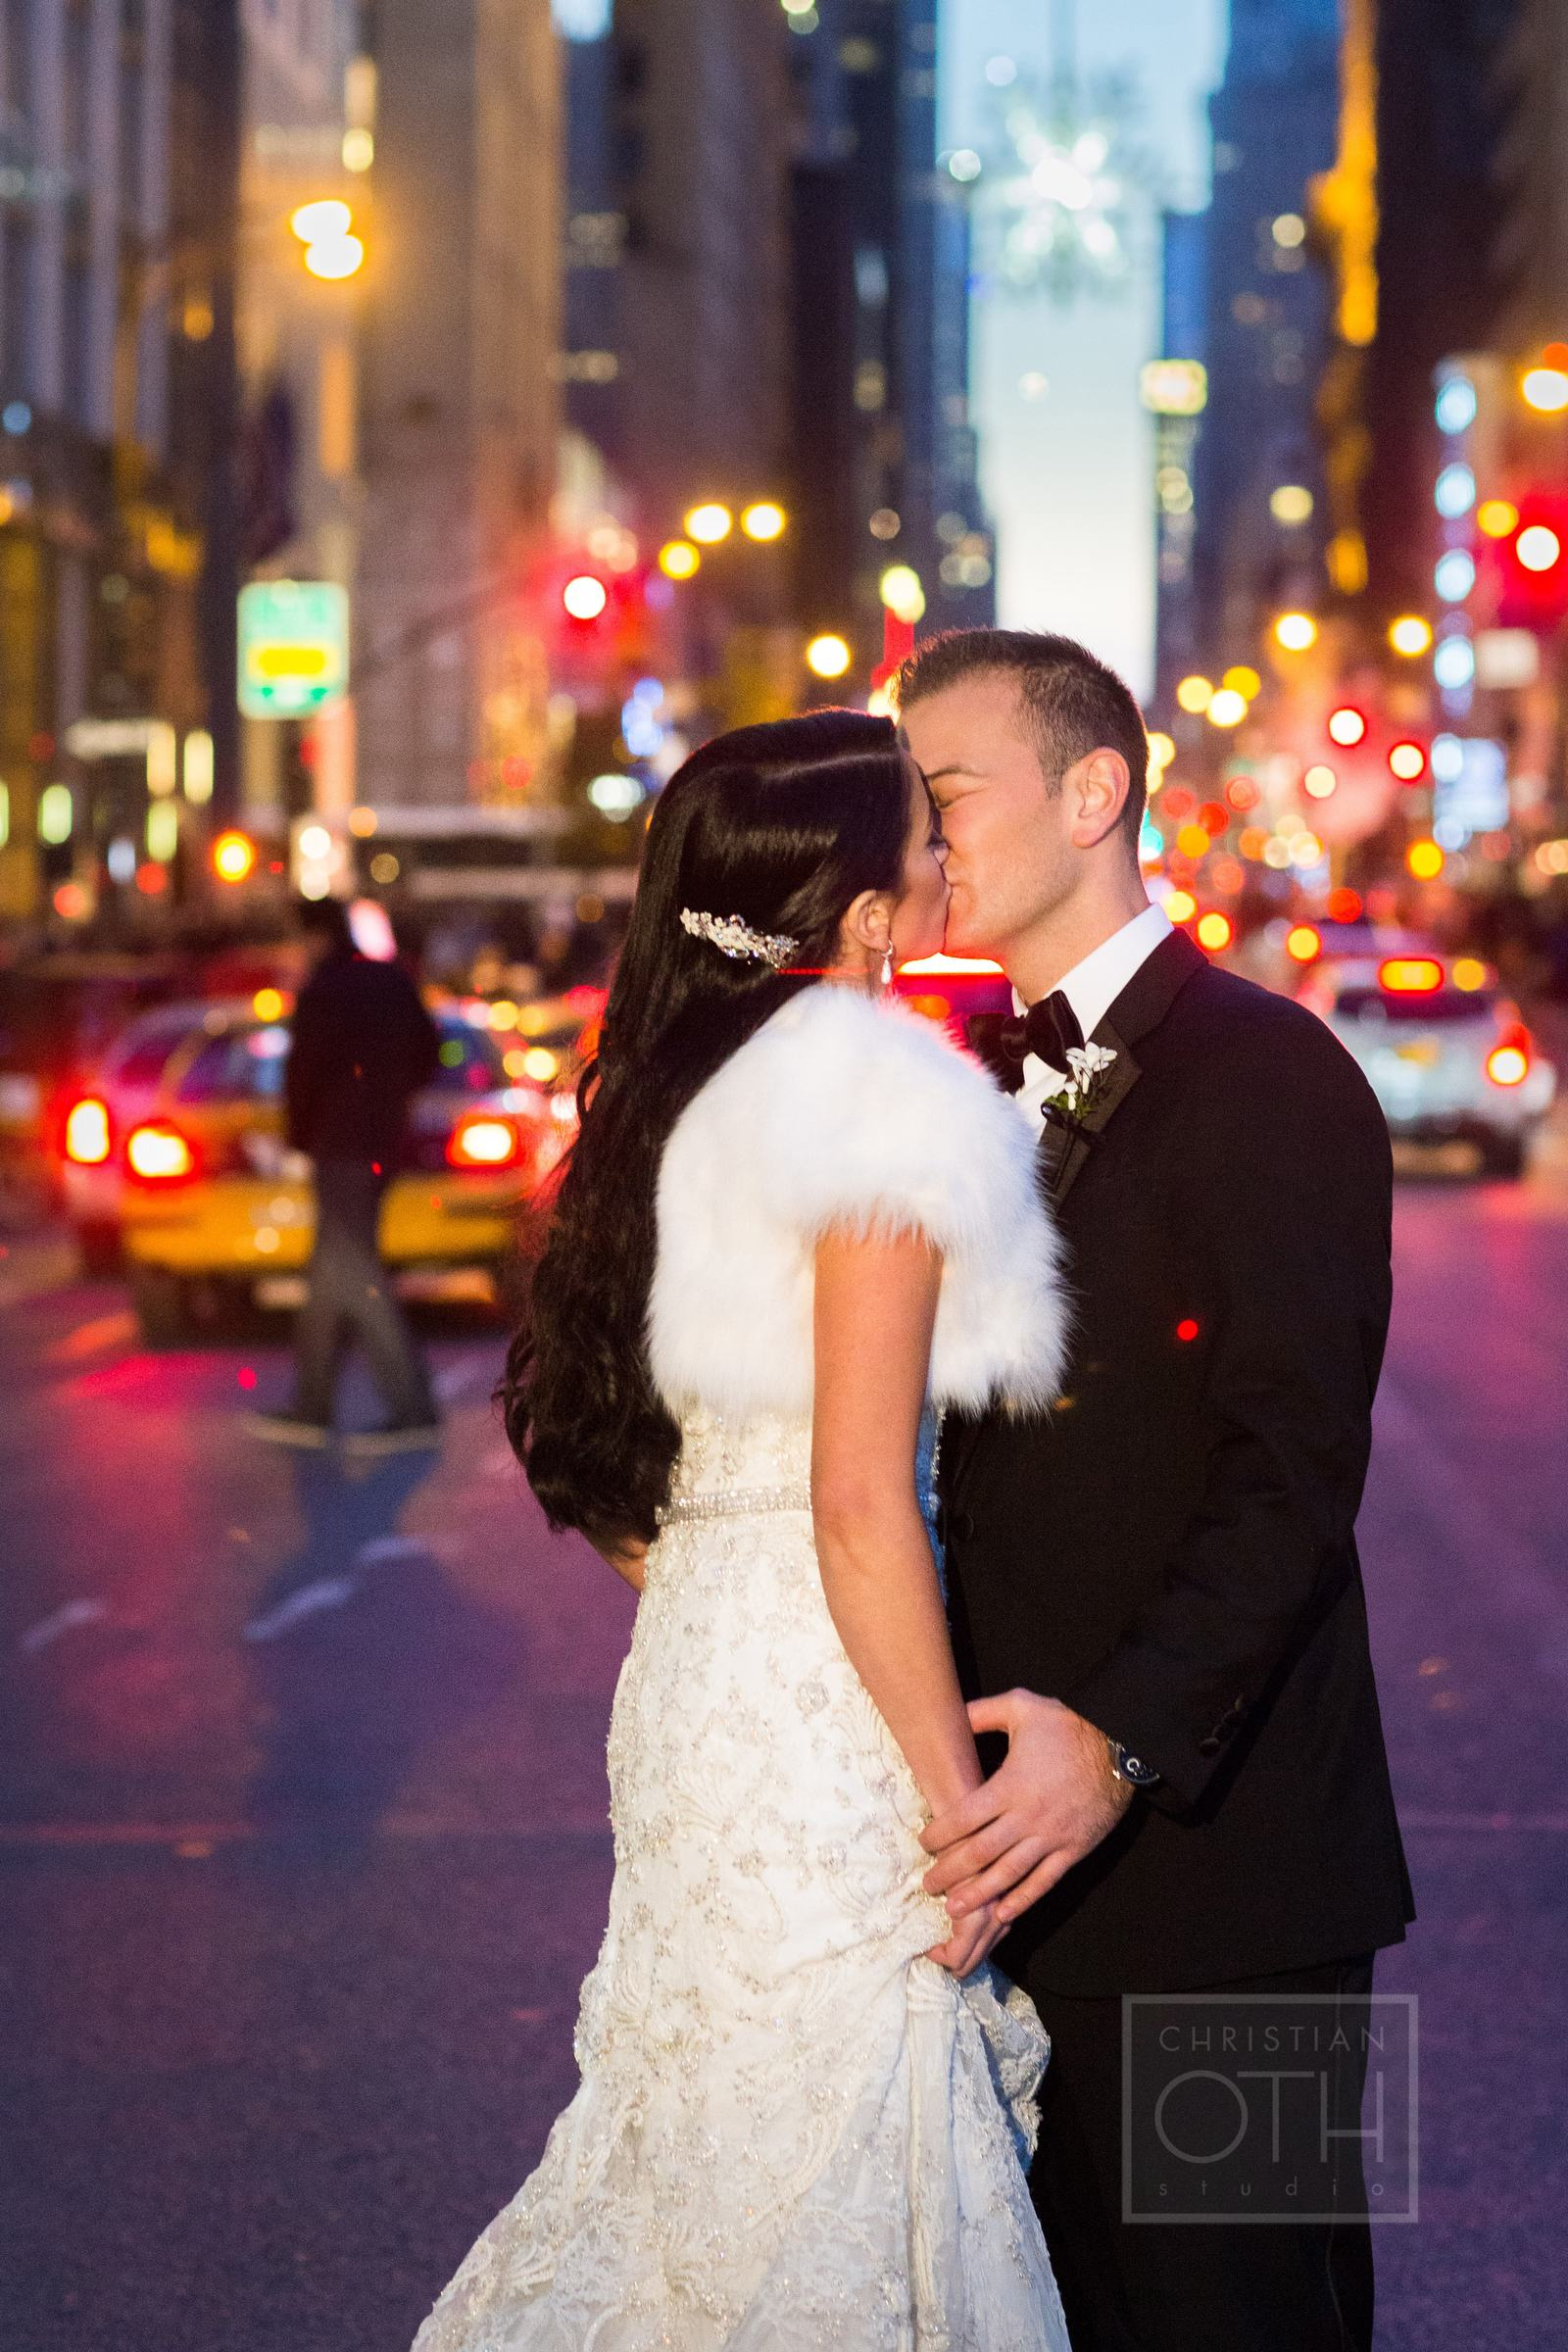 Ceci_New_York_Custom_Invitation_Pierre__City_ Destination_Wedding_Luxury_Personalized_Ceci_Style_Bride_Rose_Gold_Foil_Stamping77.JPG